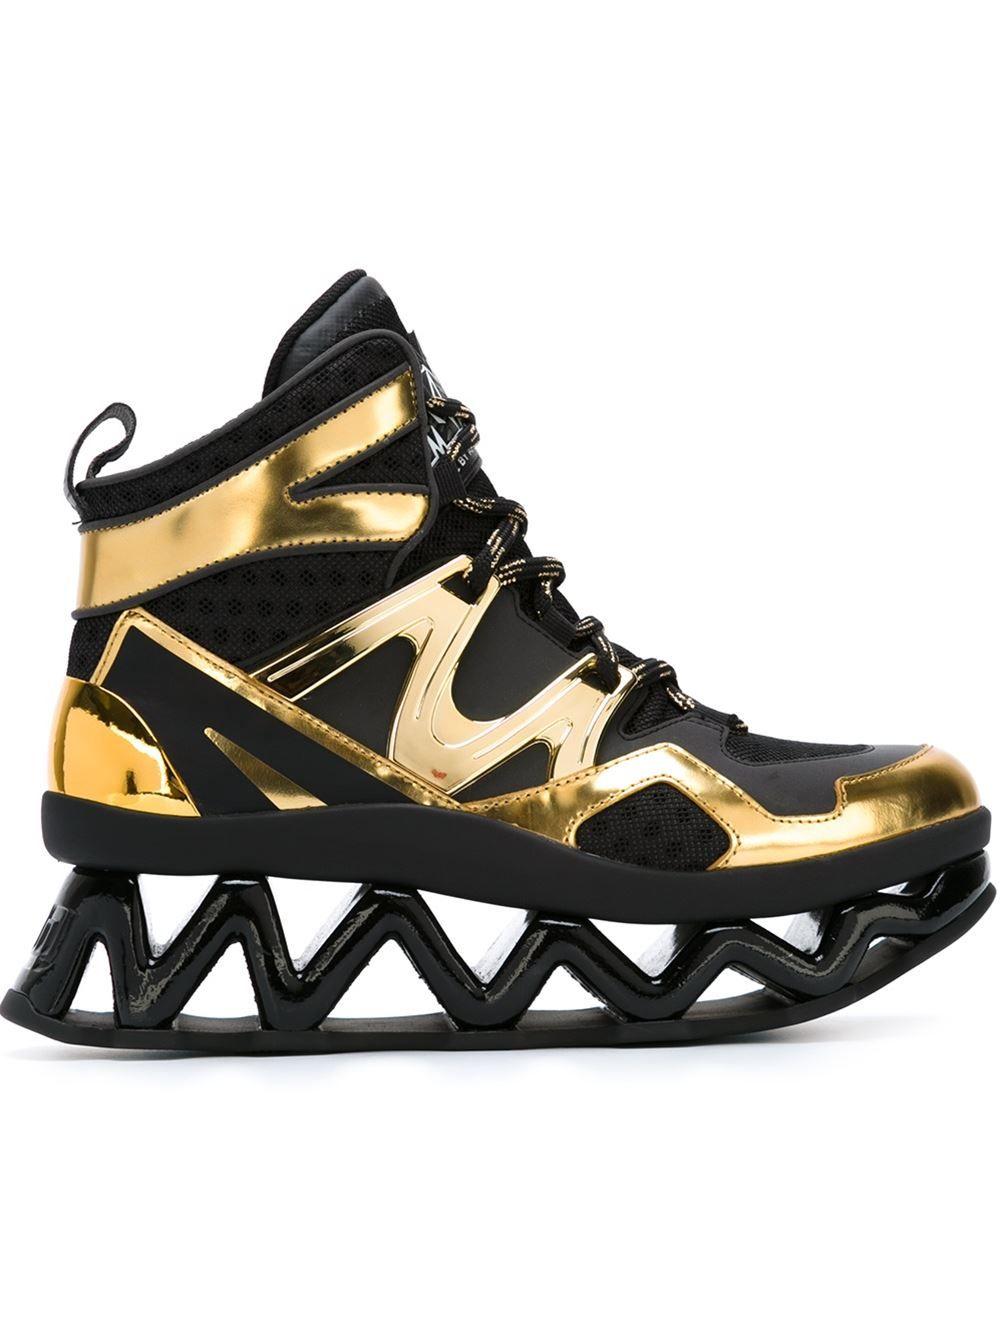 Marc By Marc Jacobs  ninja  Sneakers - Biondini Paris - Farfetch.com ... d9a8722686b7